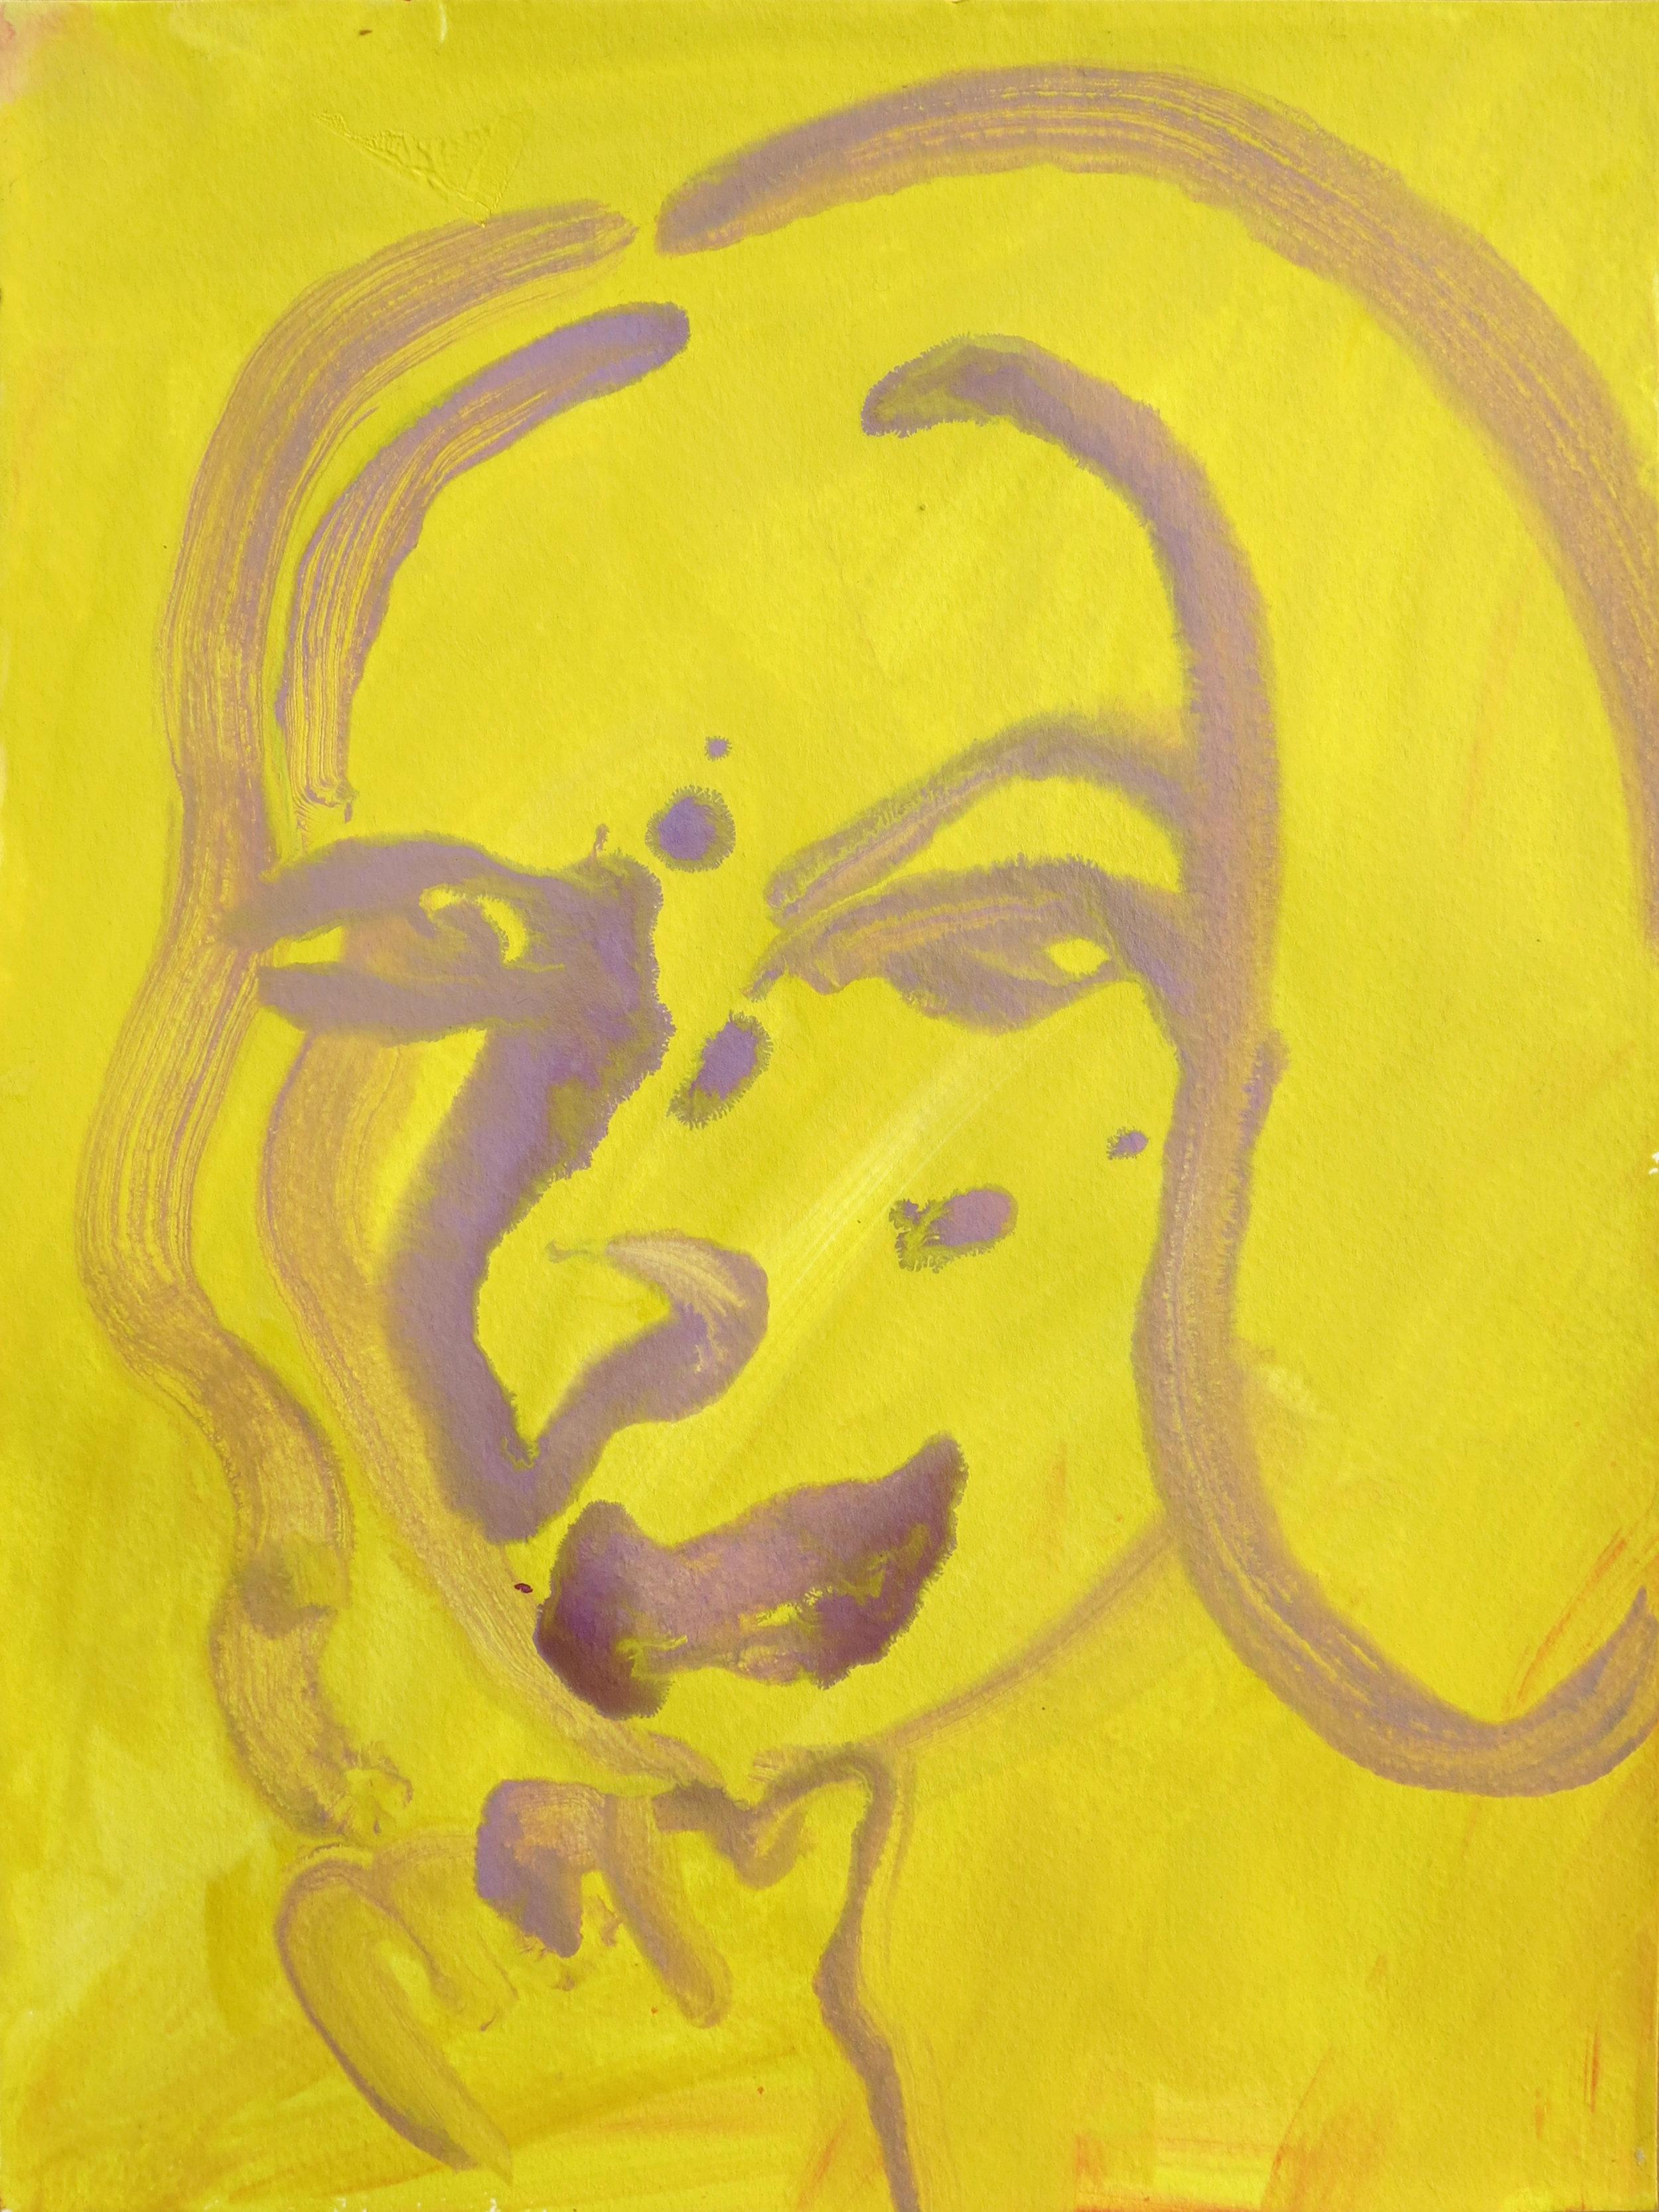 Barbra Streisand Portrait #12